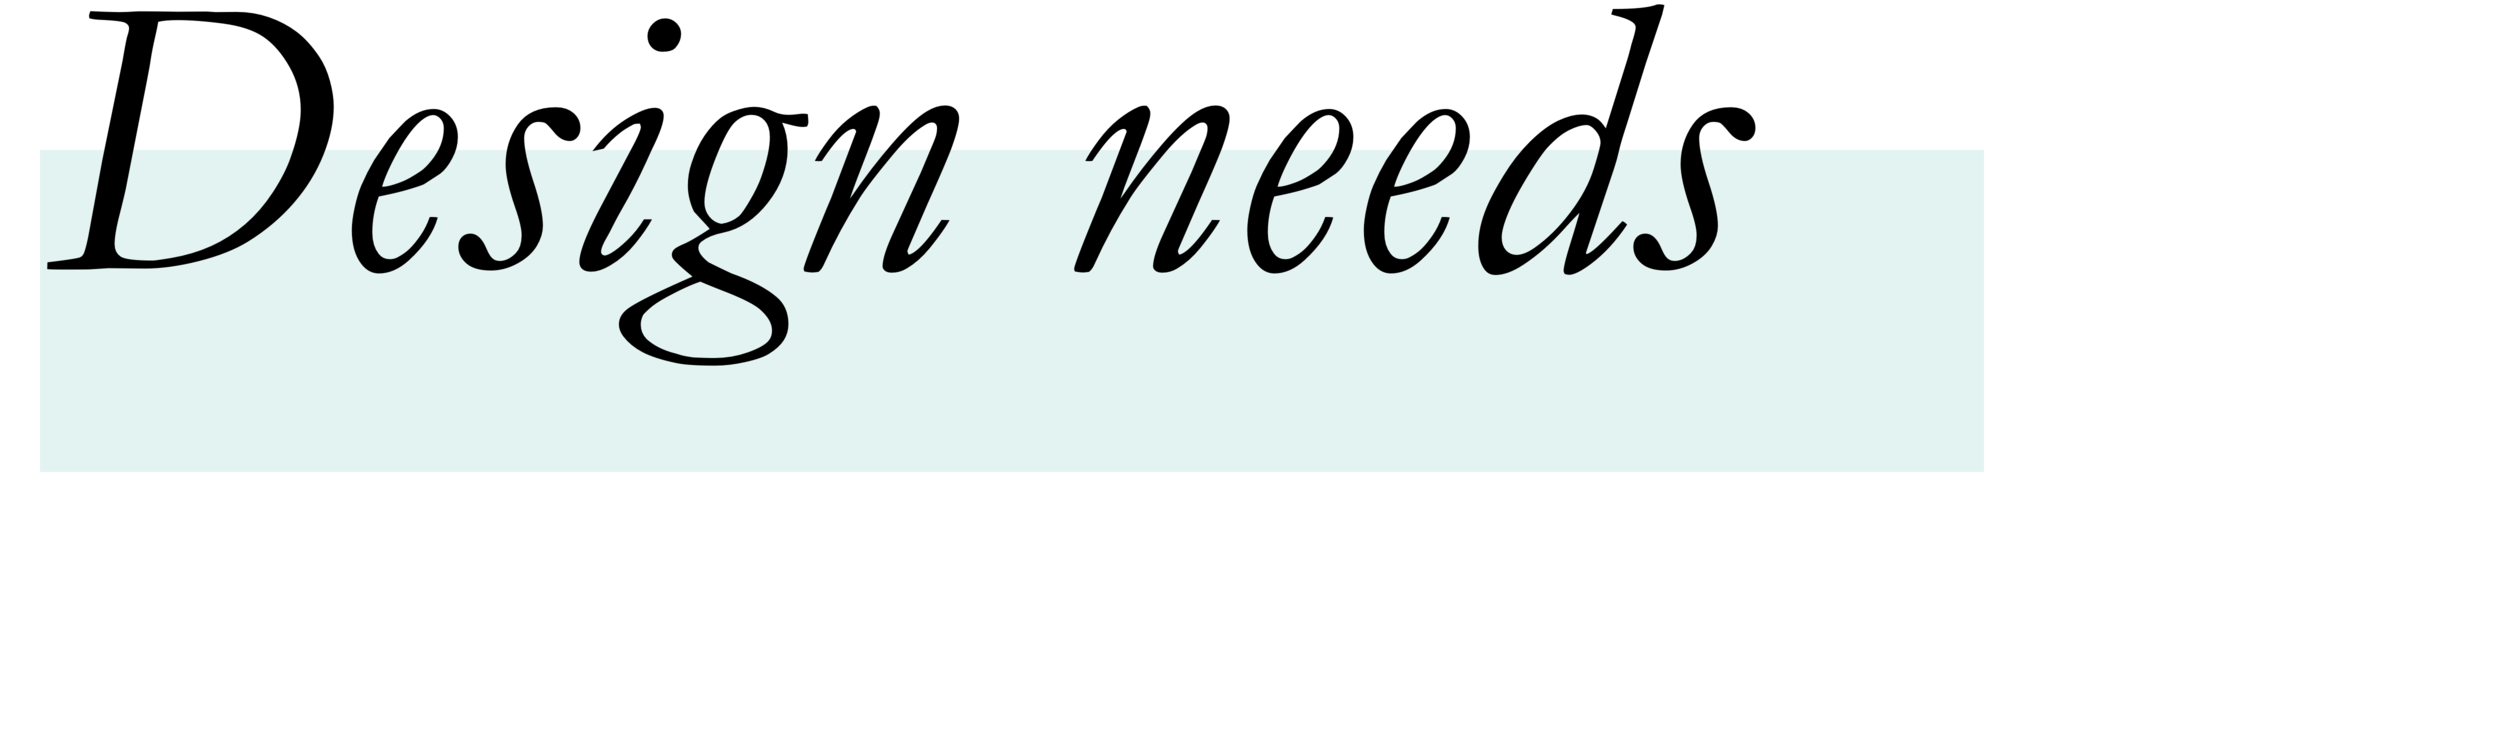 Design needs.png